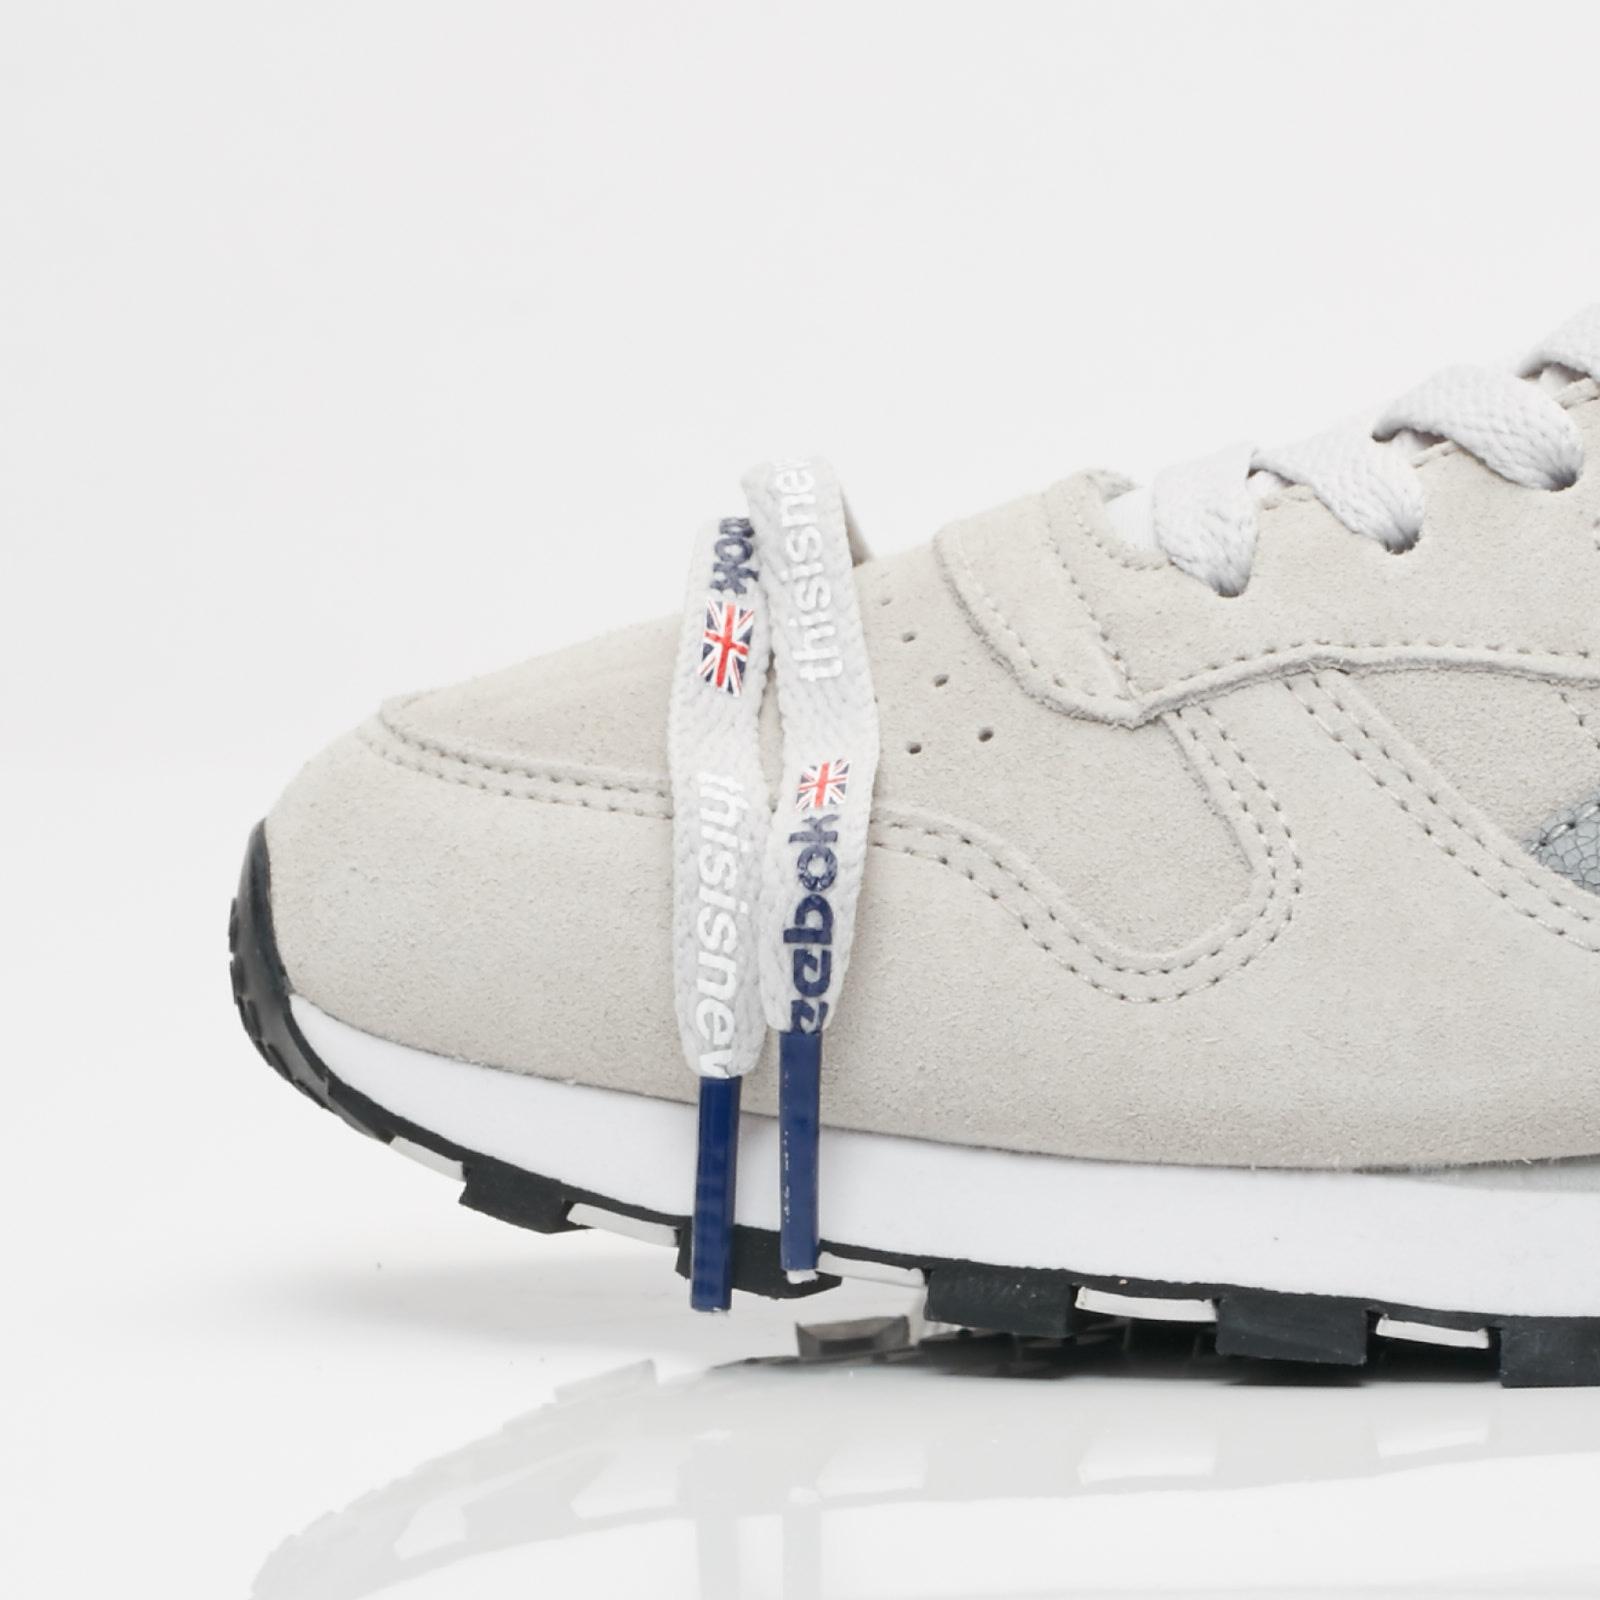 df0fc8bb1691 Reebok Classic Leather x Thisisneverthat - Cn1728 - Sneakersnstuff ...